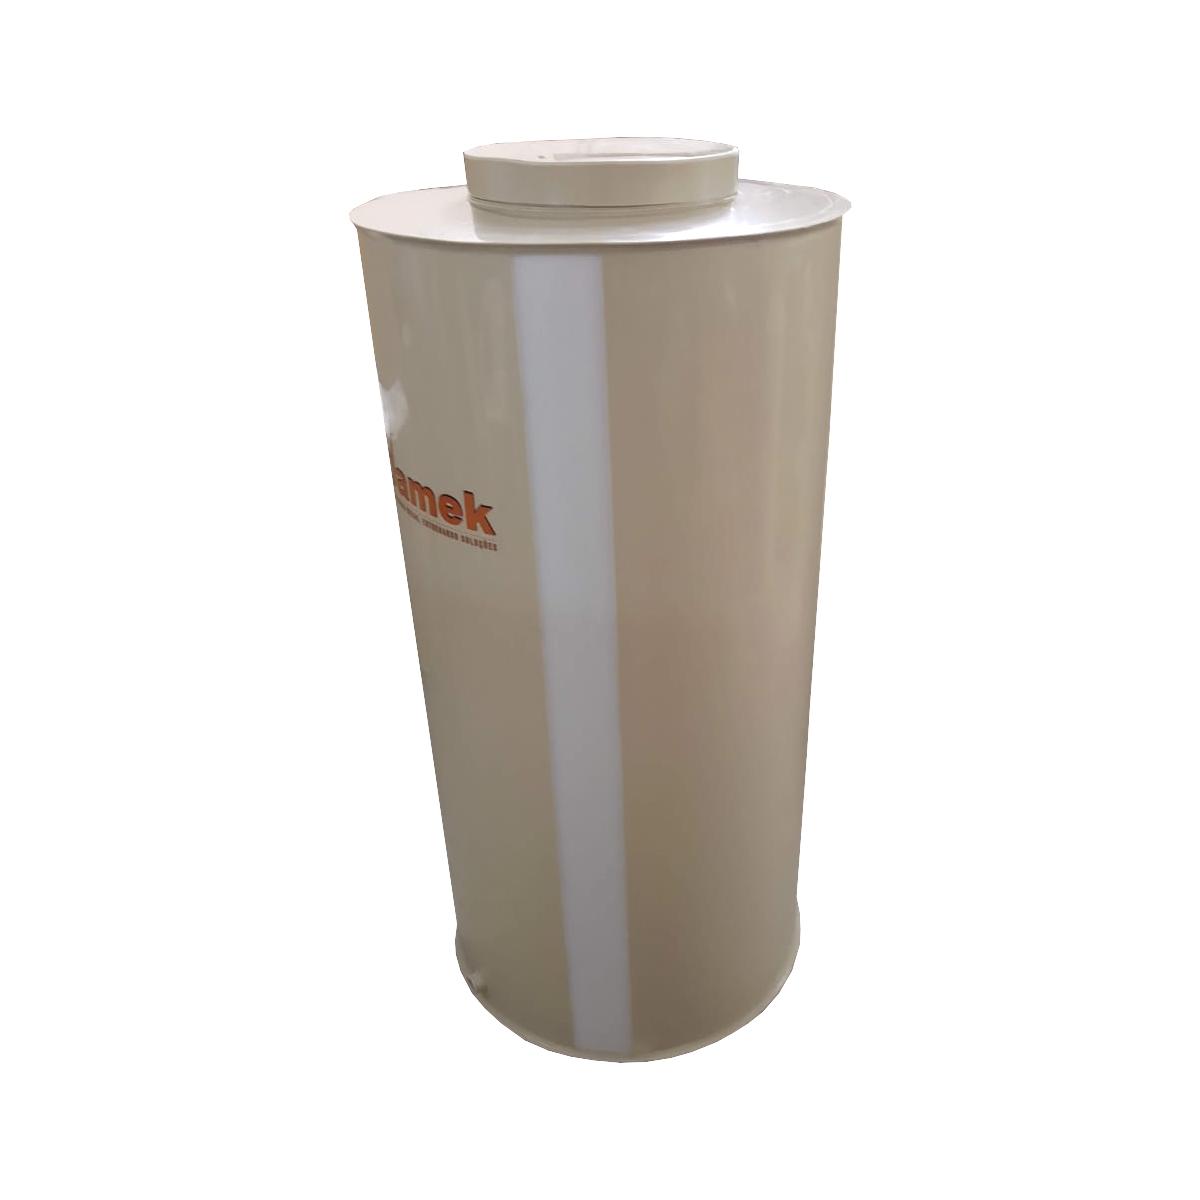 - Reservatório Plástico 150 L / Atóxico / Sem Visor Nível